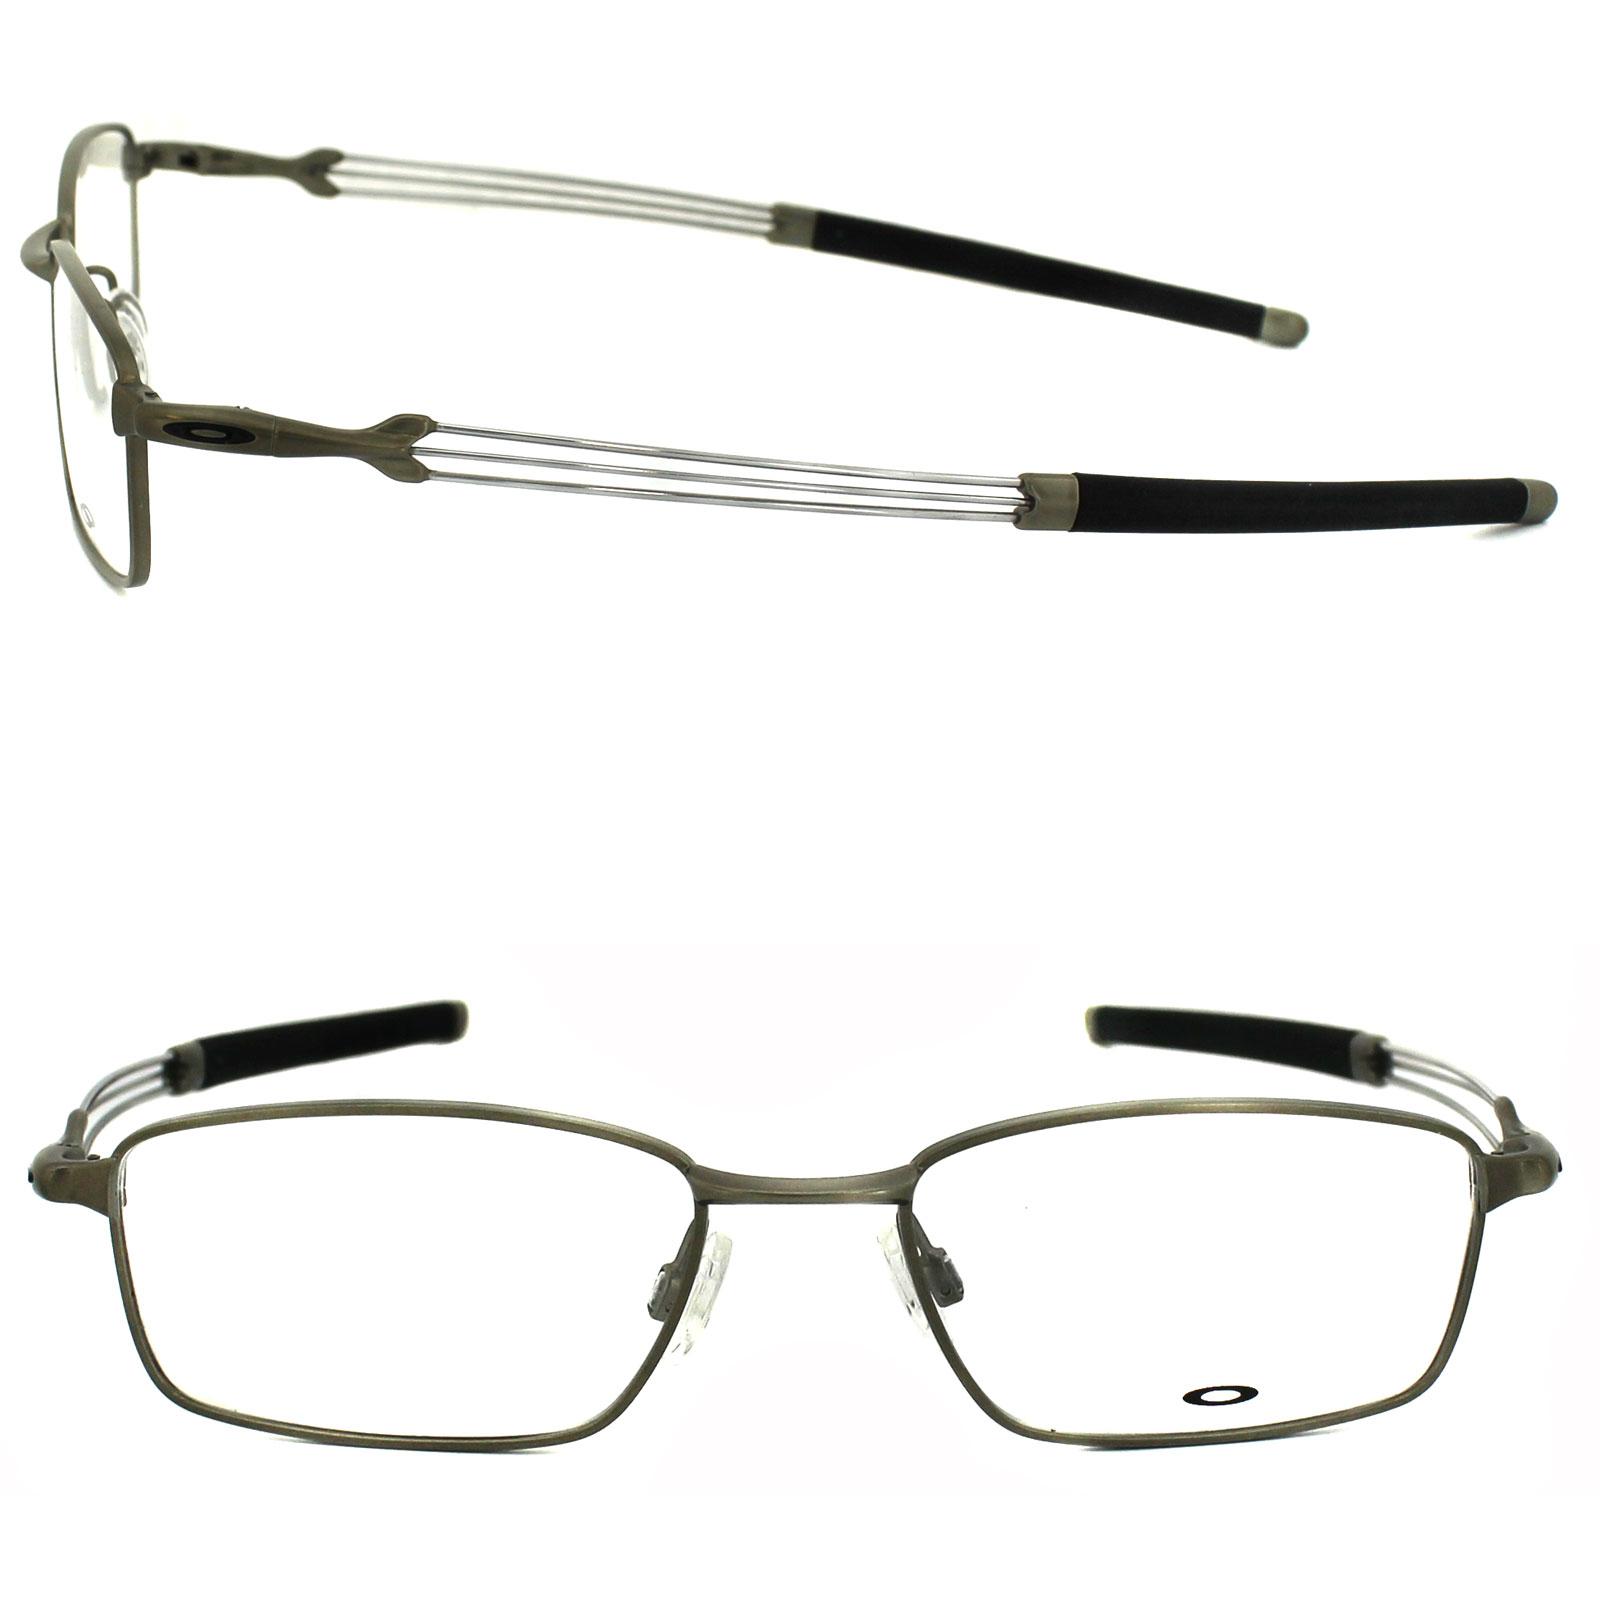 ab0d1e41eb Oakley Sunglass Replacement Lenses Sunglasses and Eyeglasses .